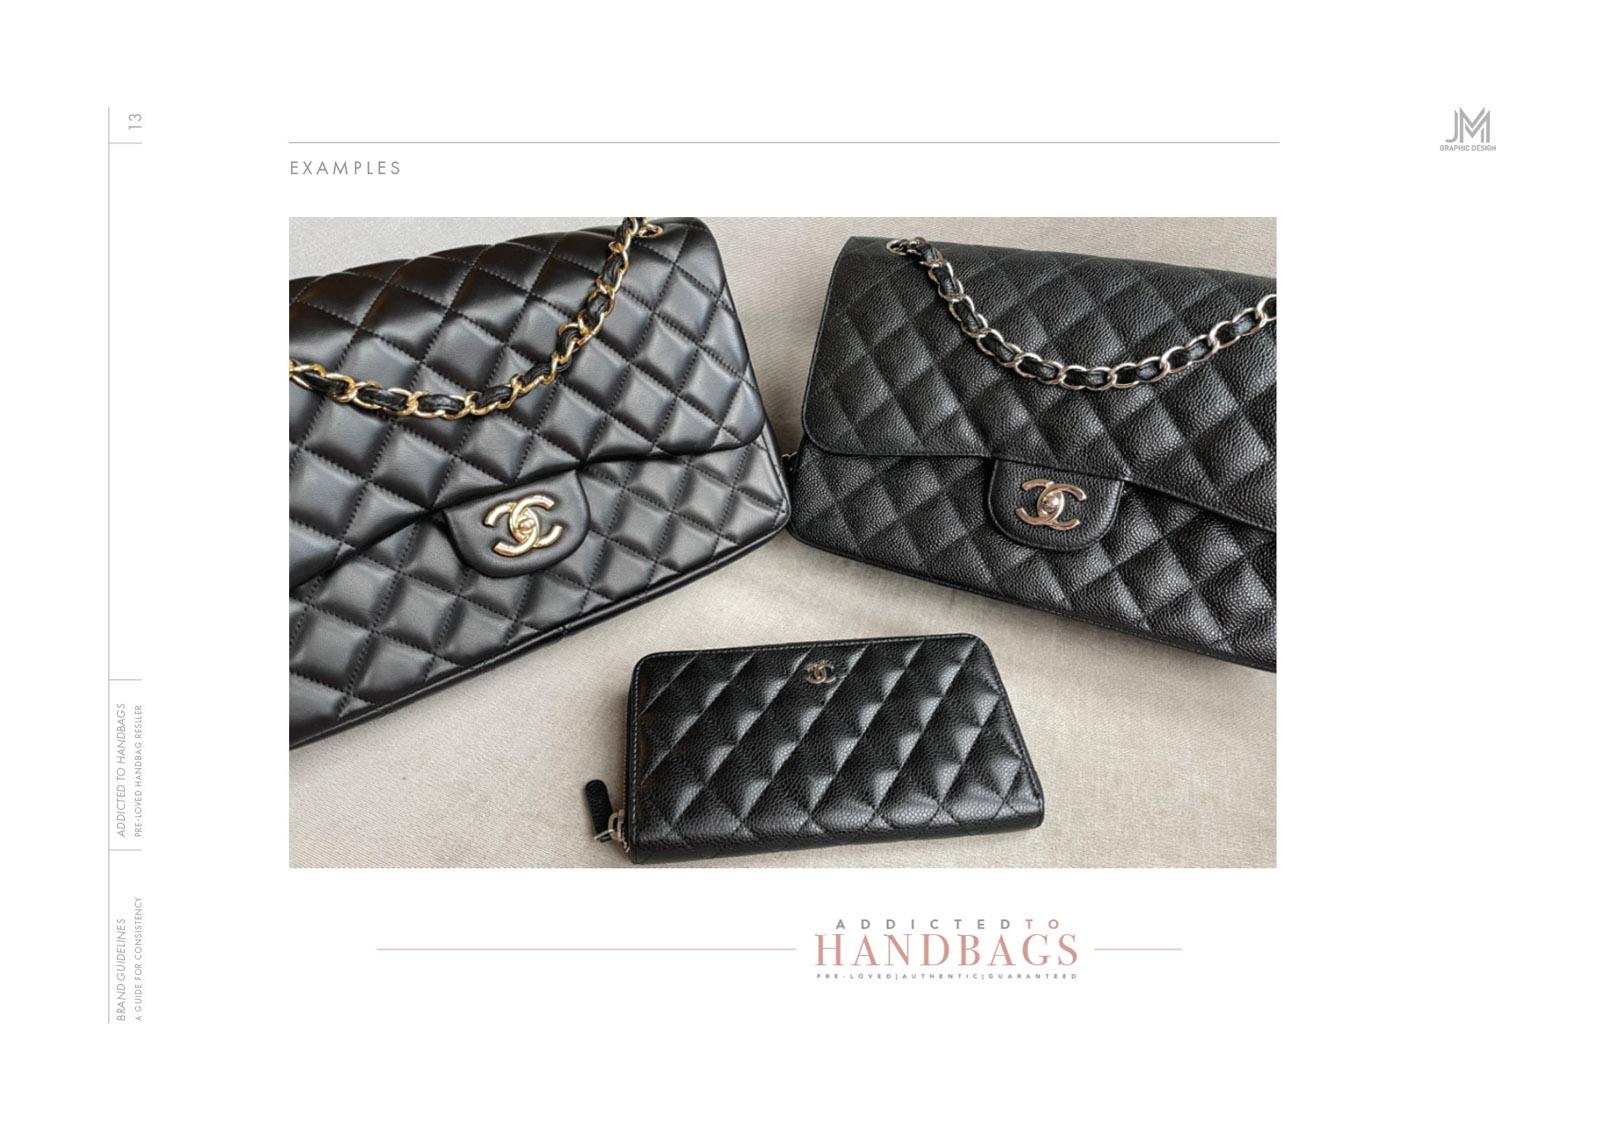 handbag-luxury-brand-identity-logo-design11